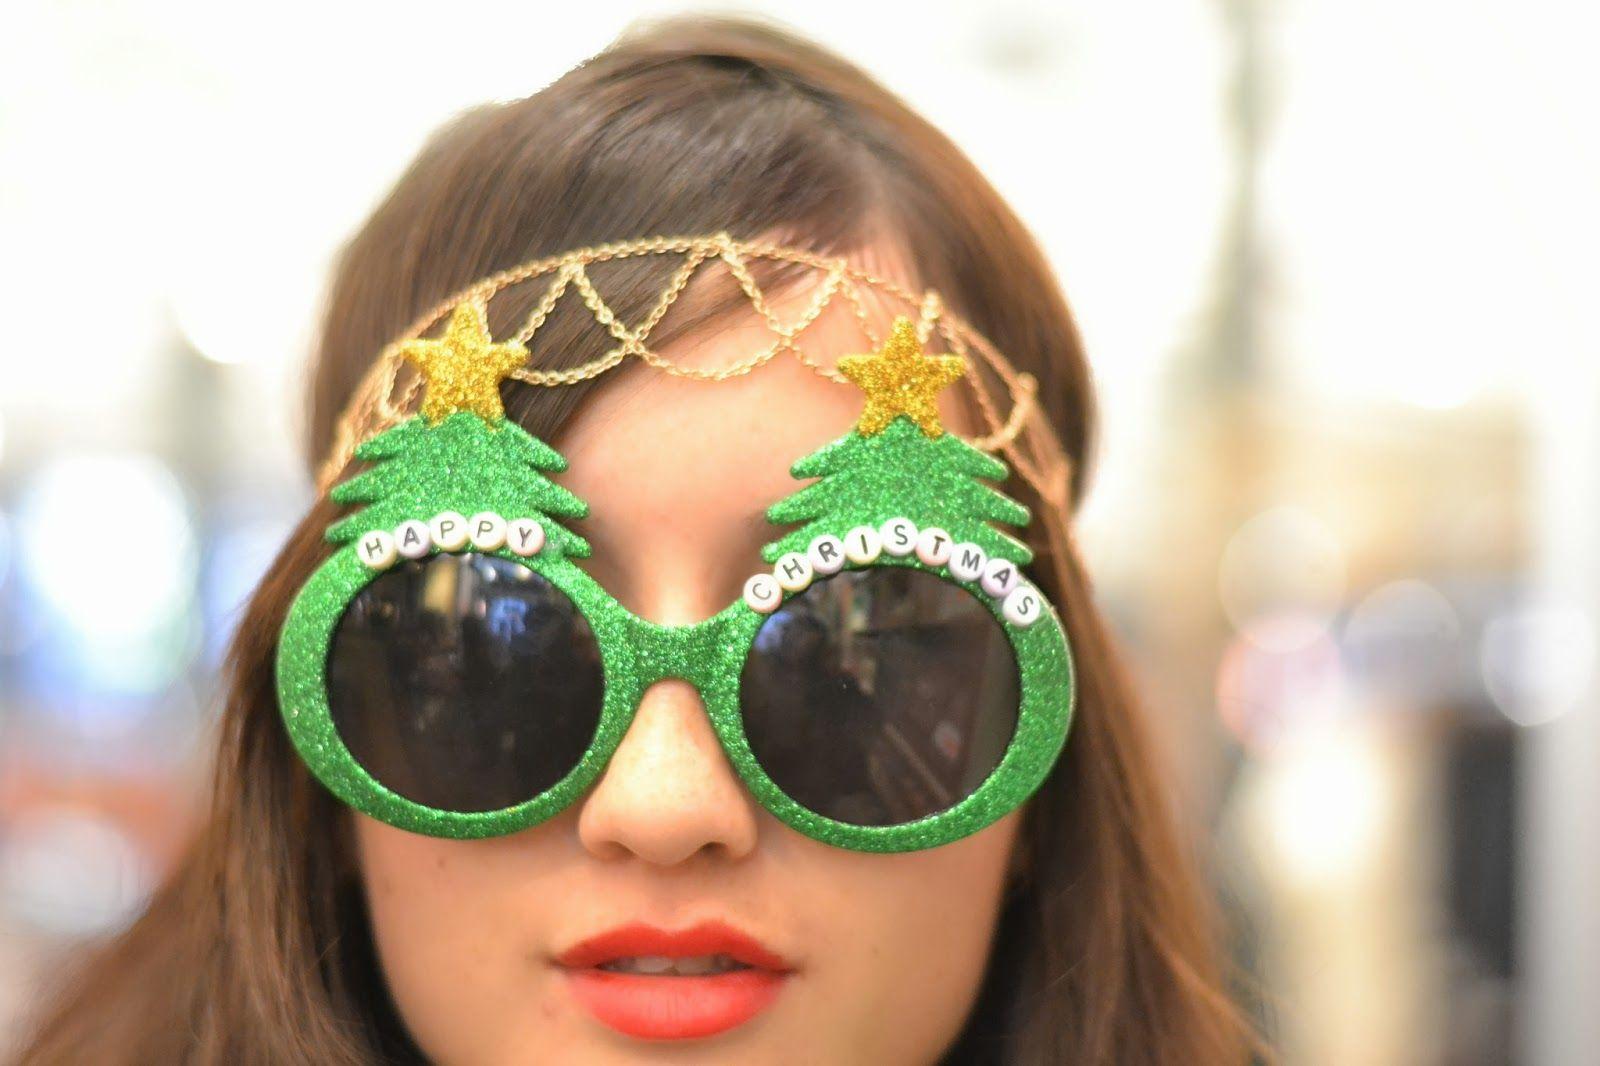 Happy christmas sunglasses